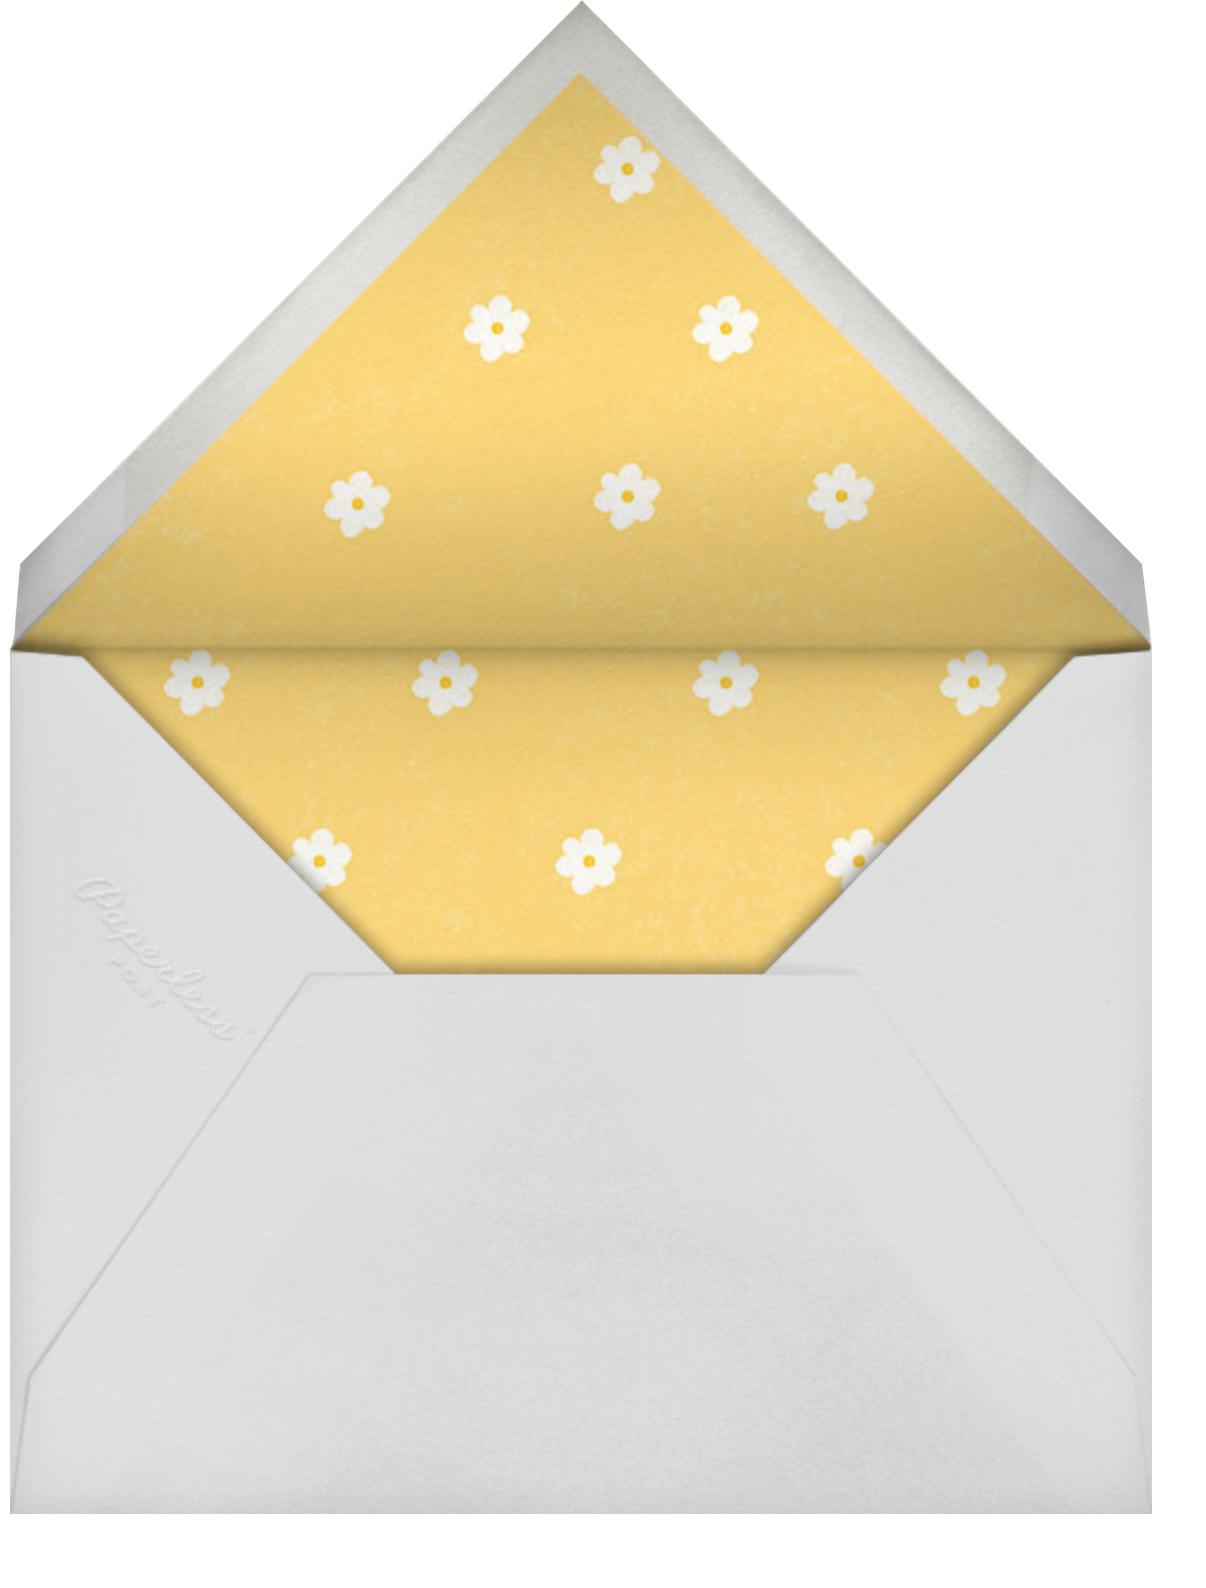 Tree House - Paperless Post - Envelope